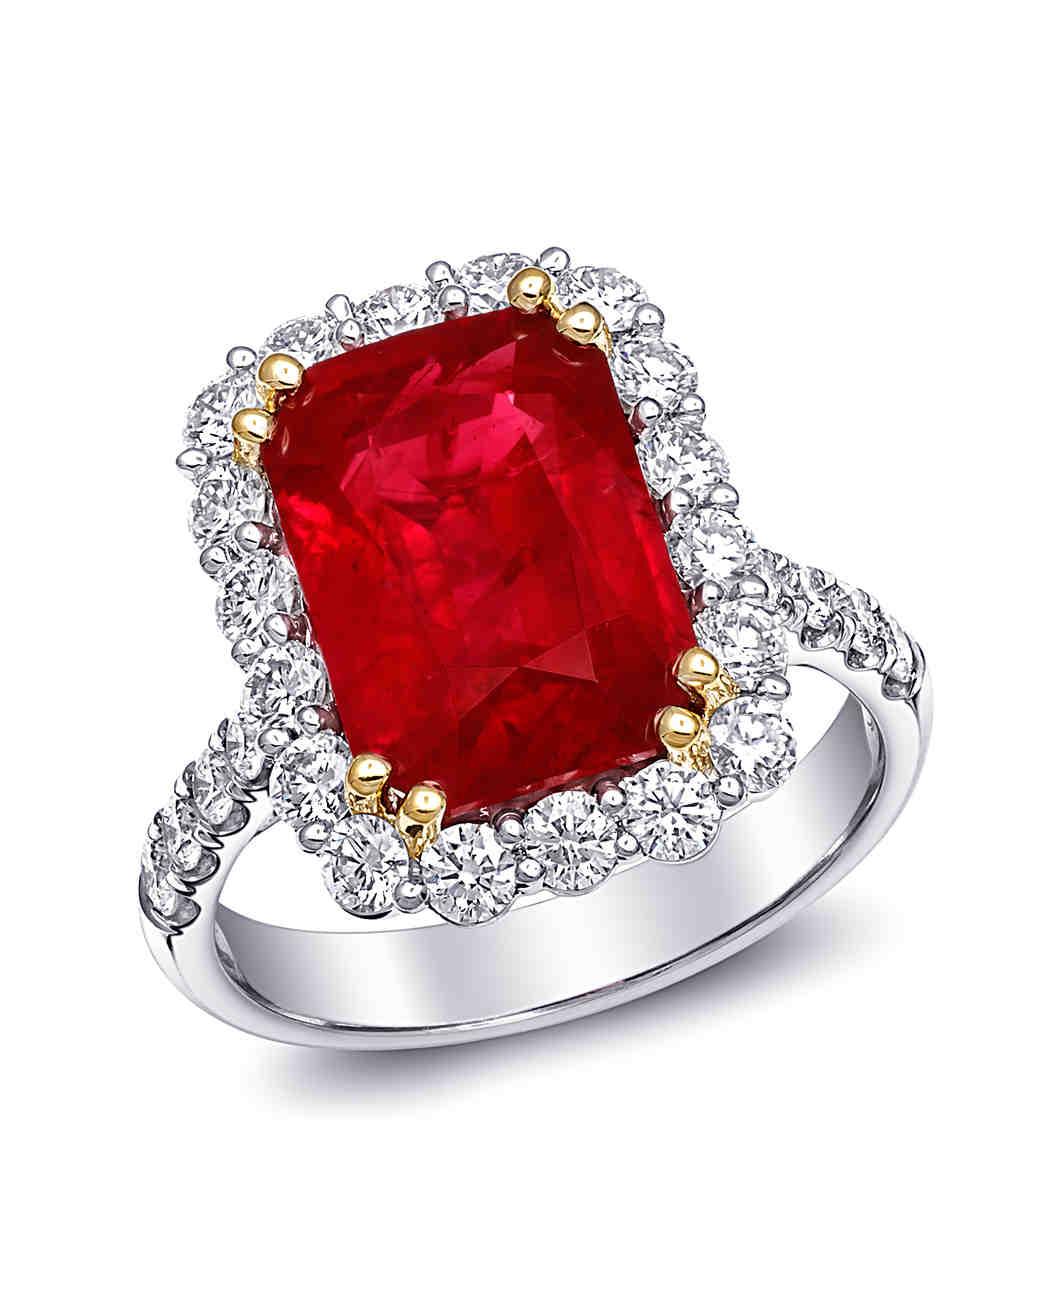 34 royal ruby engagement rings | martha stewart weddings frznosn